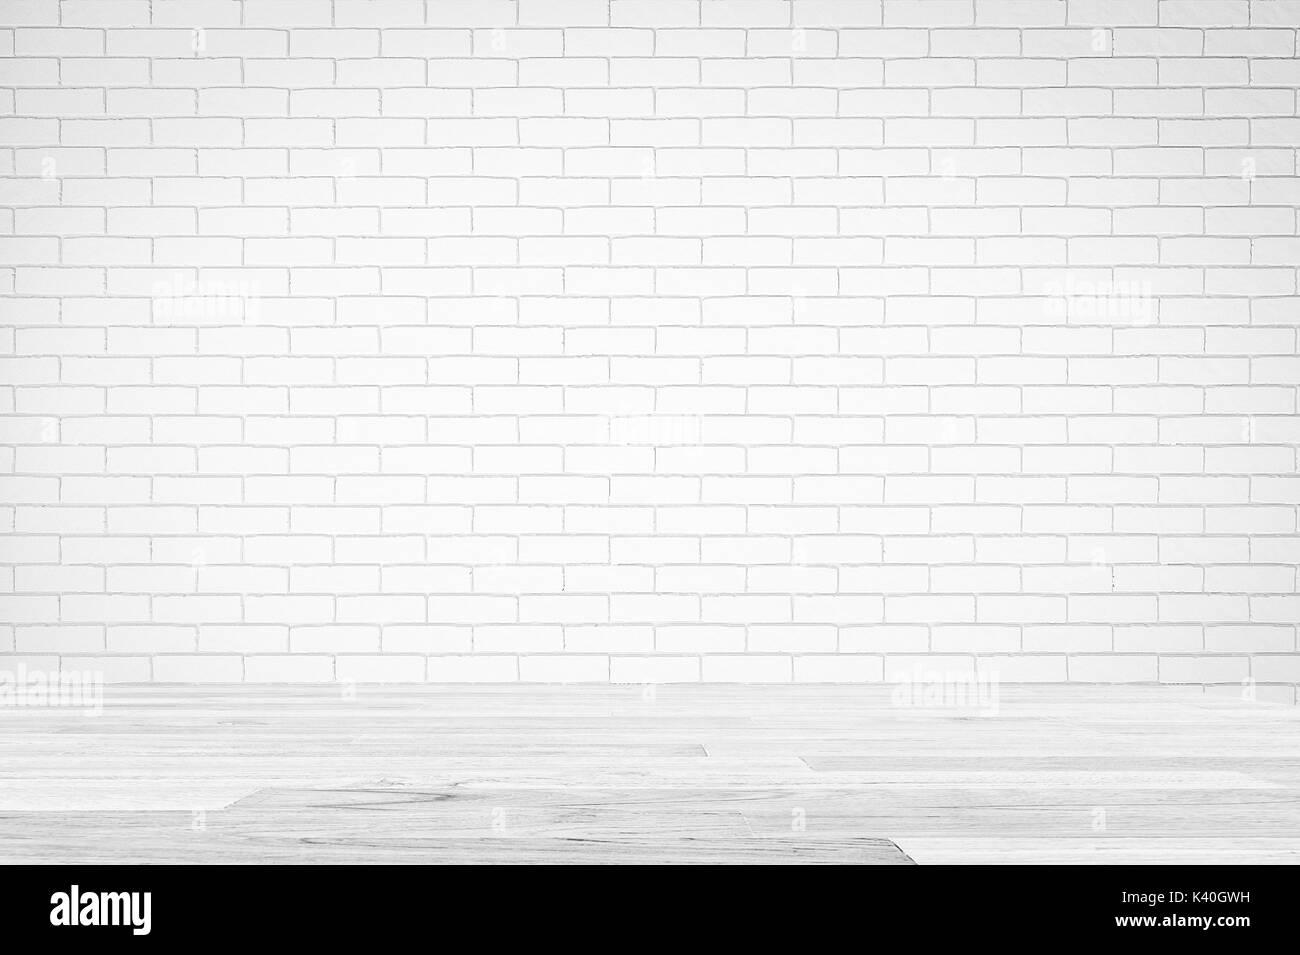 Brick Wall Design Template Stockfotos & Brick Wall Design Template ...